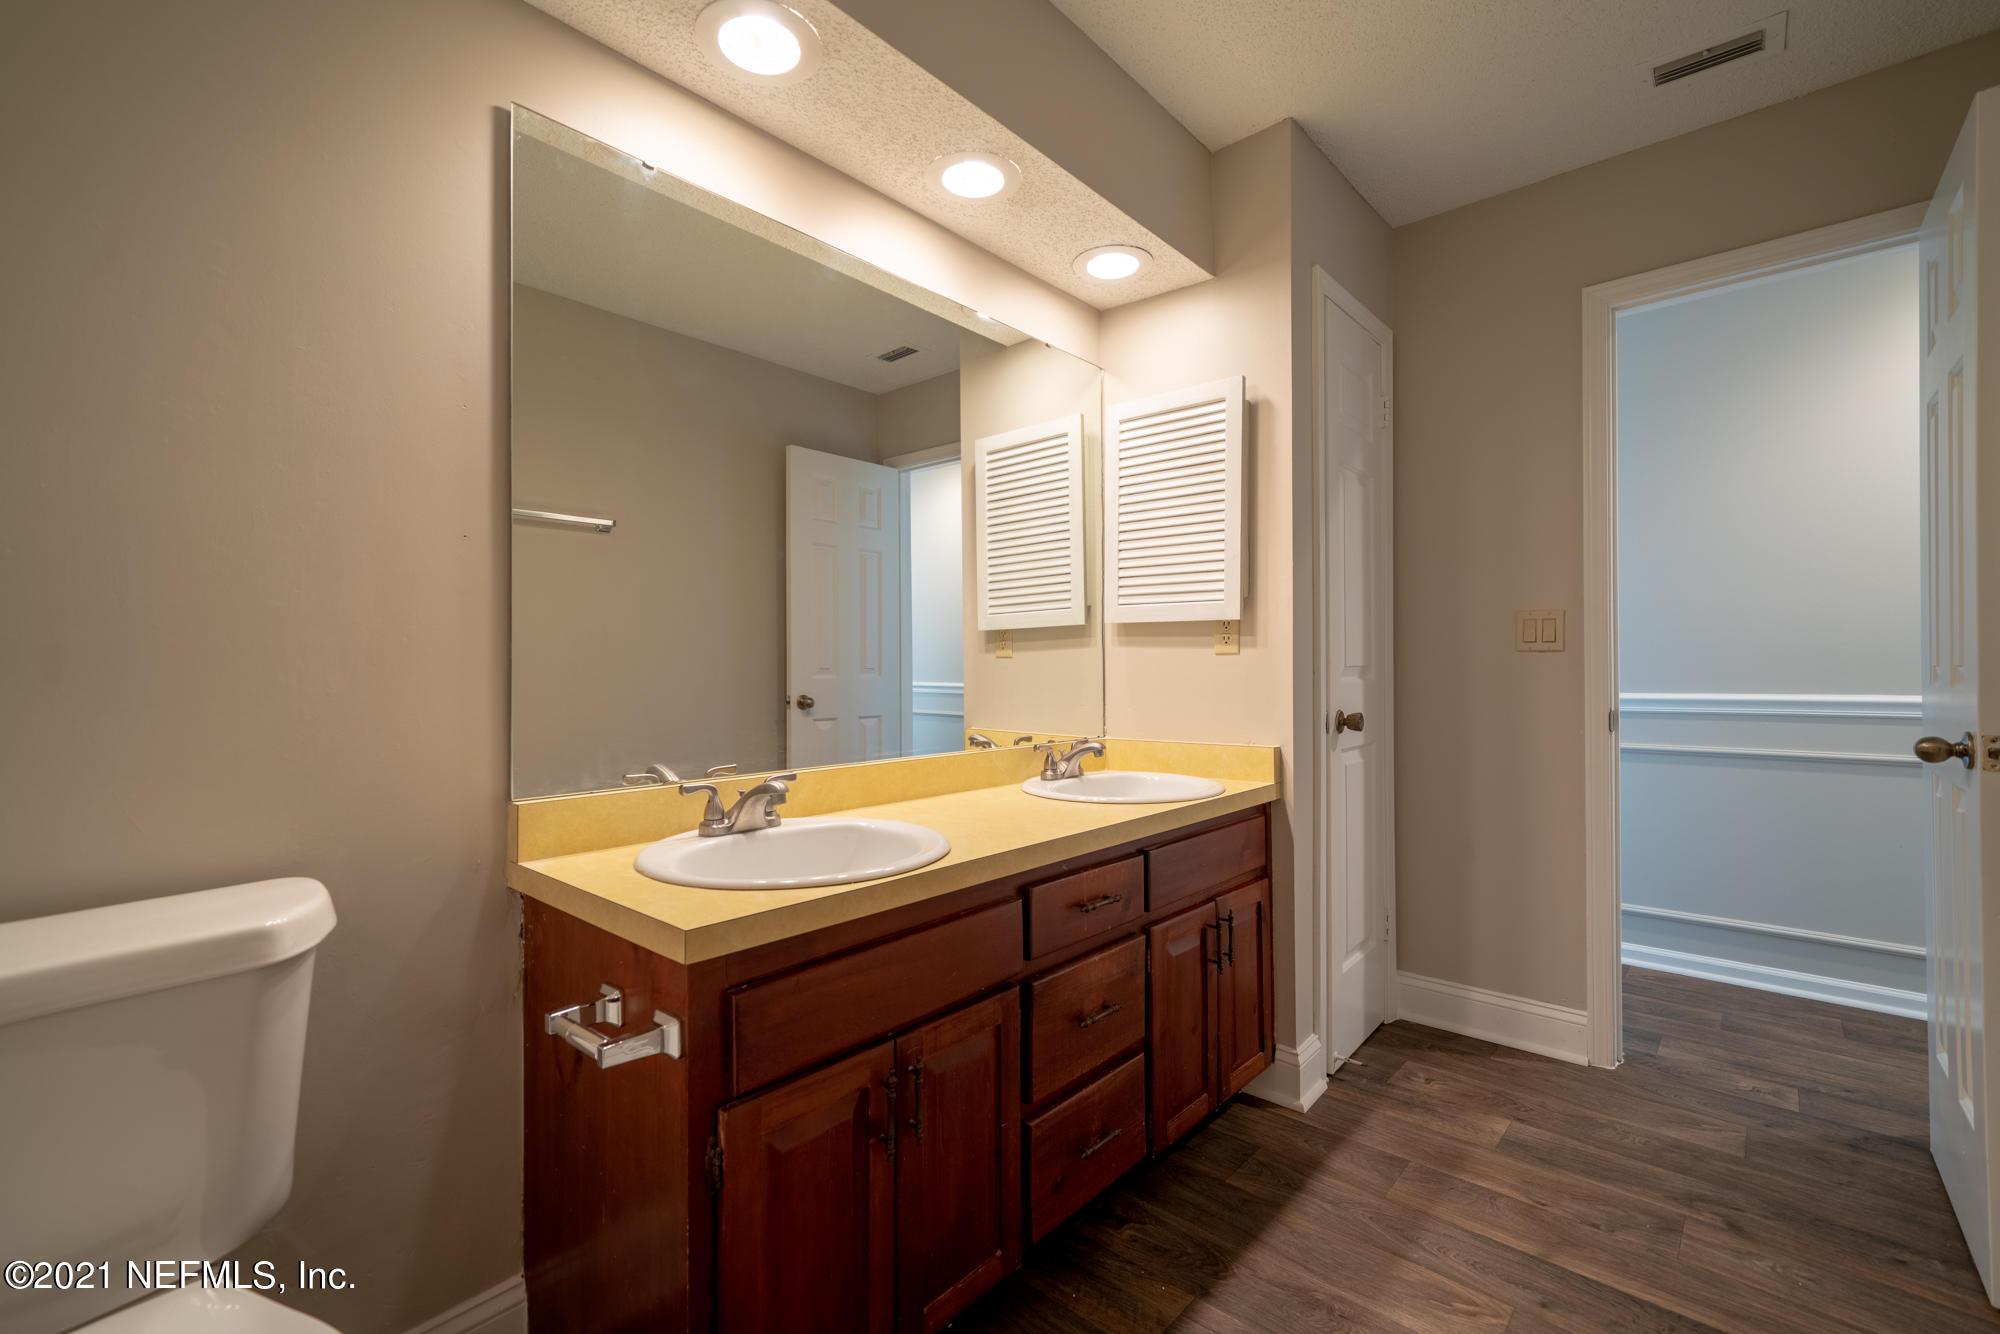 61 PREAKNESS, ORANGE PARK, FLORIDA 32073, 4 Bedrooms Bedrooms, ,2 BathroomsBathrooms,Residential,For sale,PREAKNESS,1108107